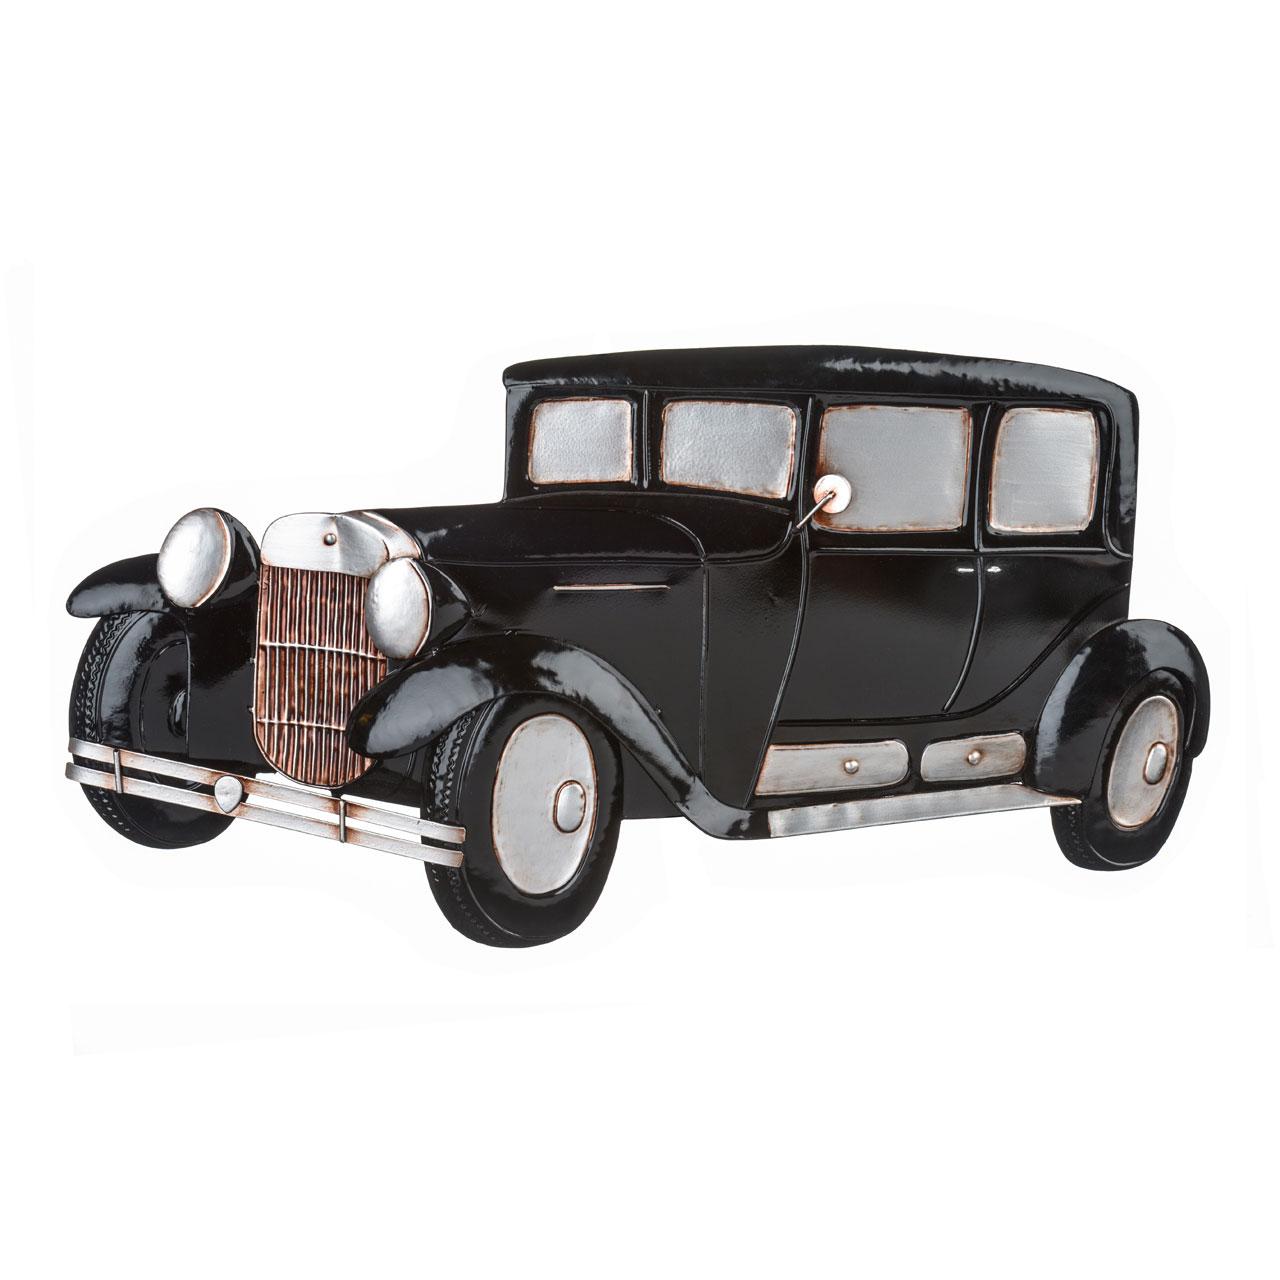 Premier Housewares Retro Car Wall Art, Metal, Vintage Style ...